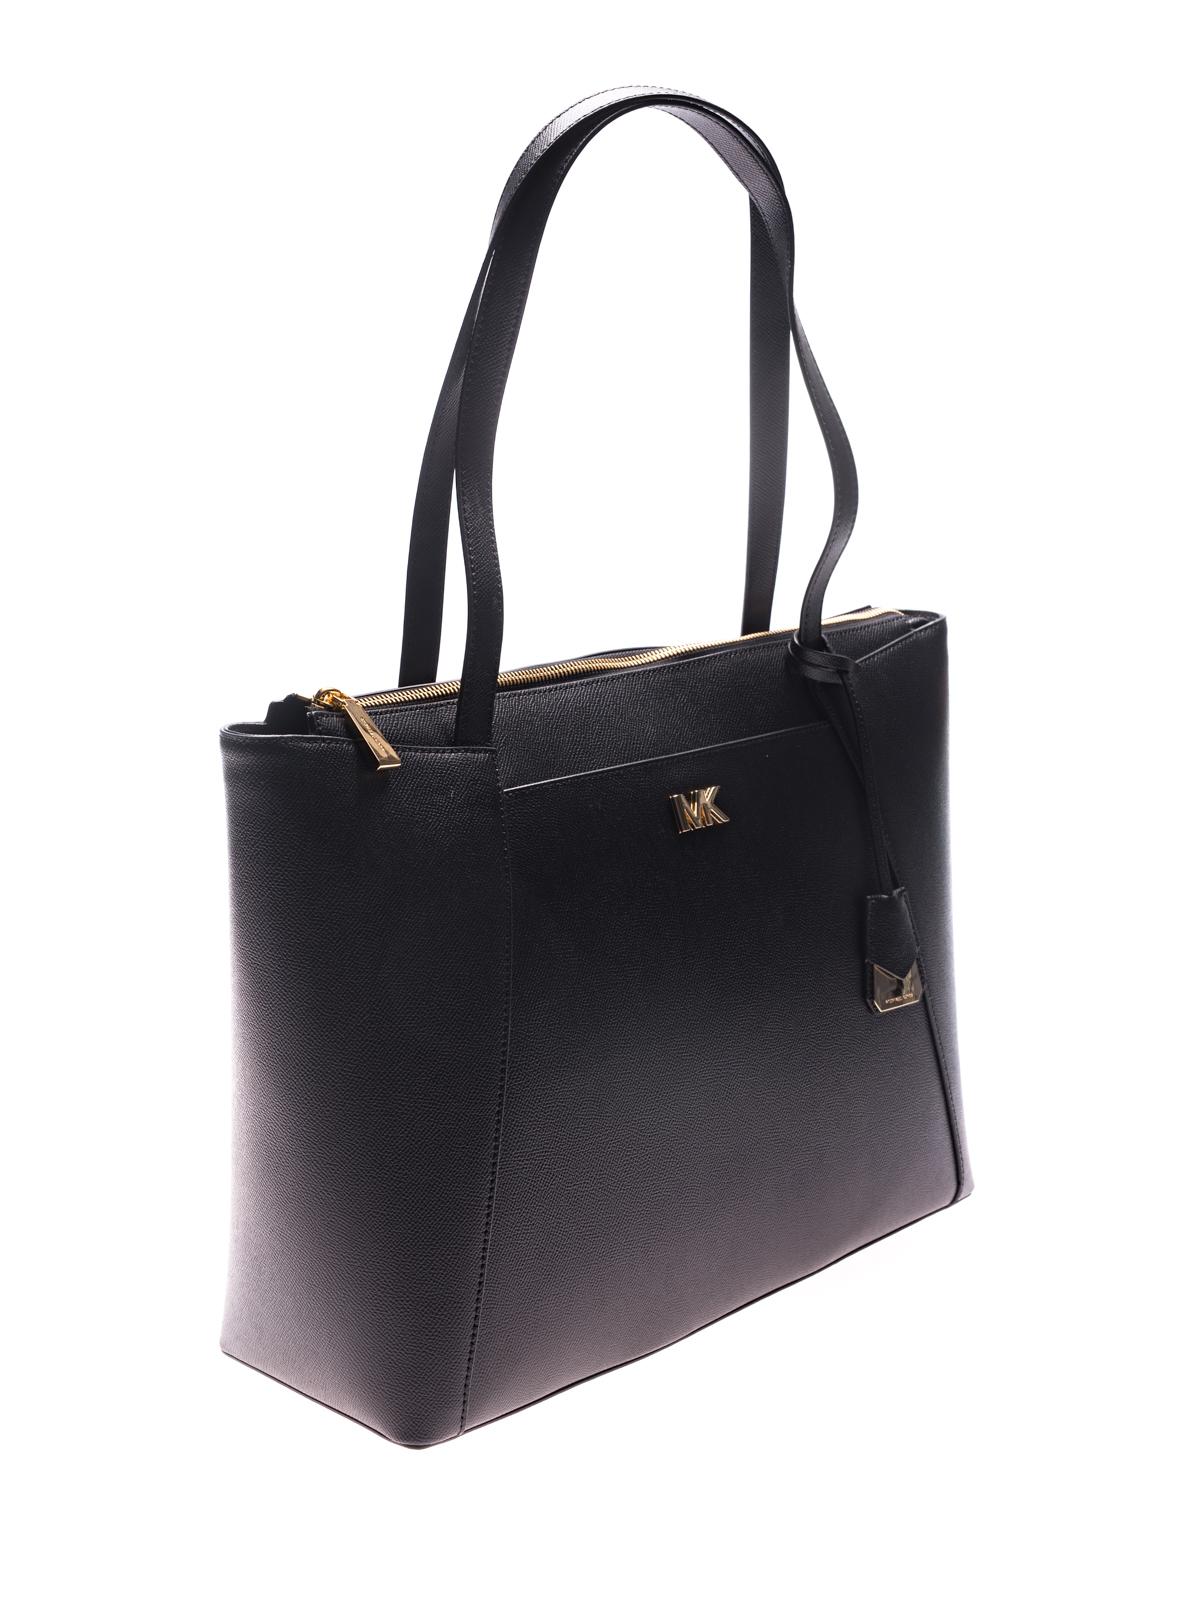 ce2eec01919617 Michael Kors Maddie Tote Black. Michael Kors Maddie Medium Crossgrain  Leather ...